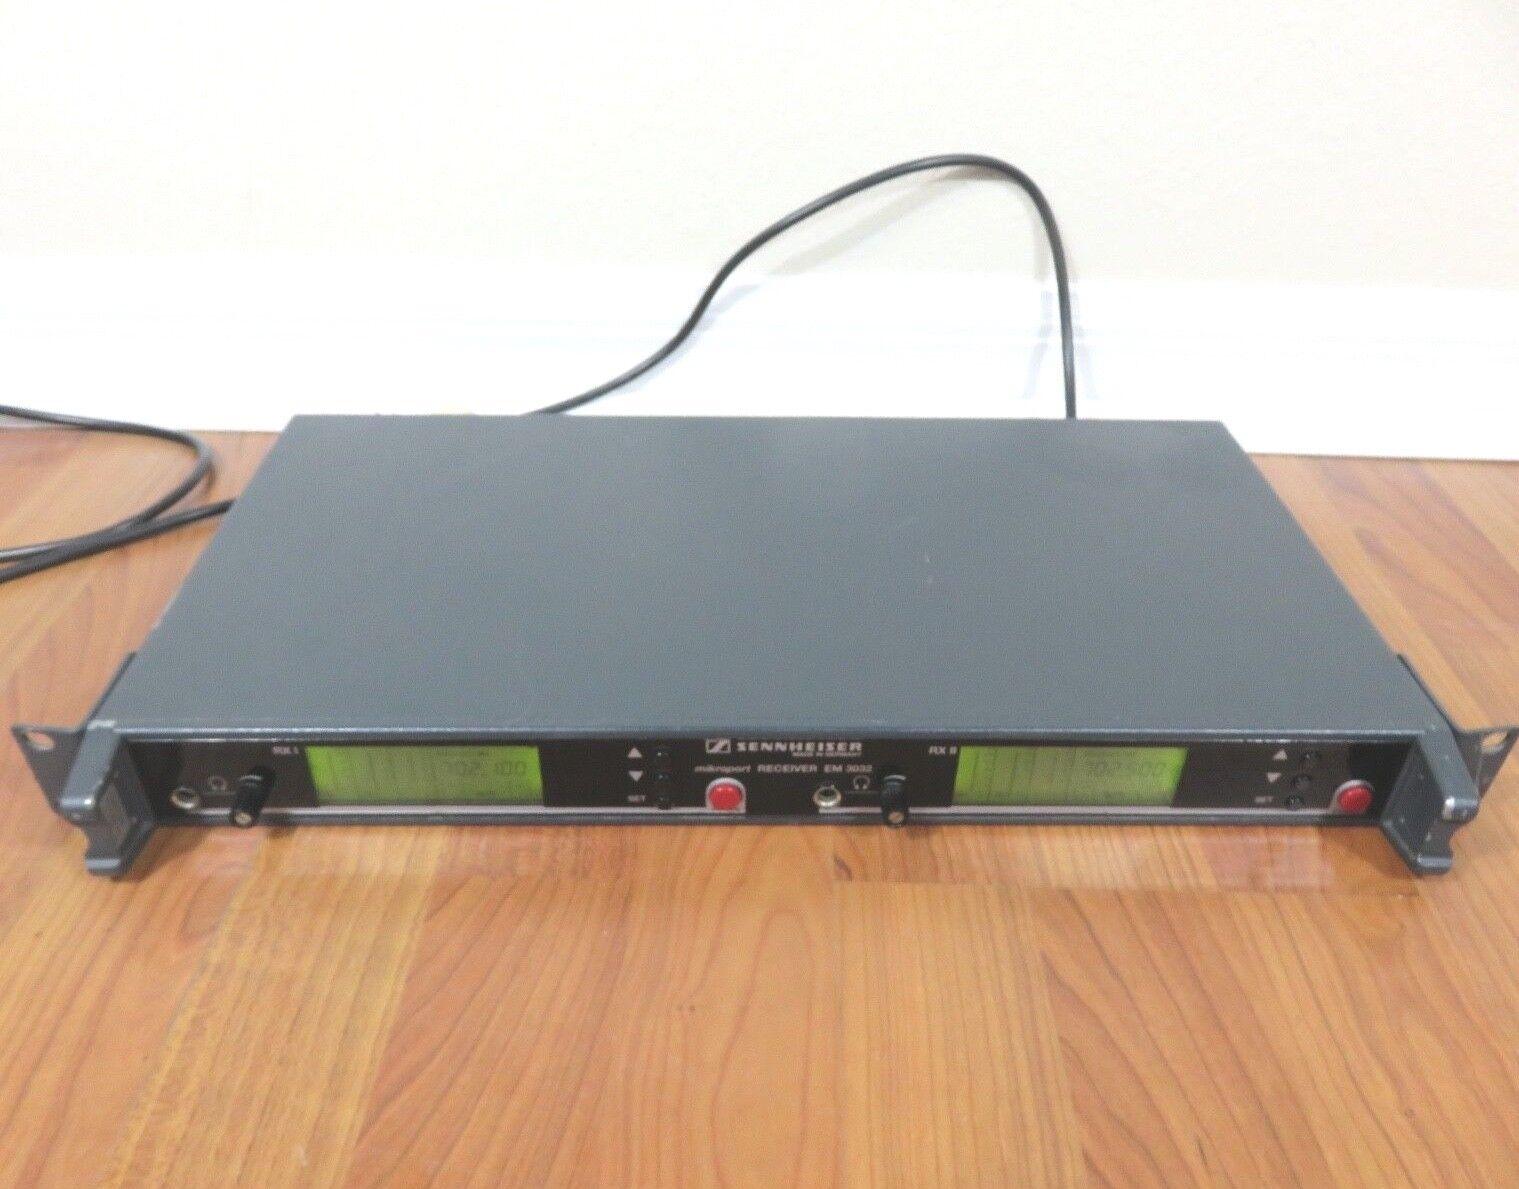 Sennheiser EM3032-U Mikroport Receiver Freq. Range 702,000-726,000 MHz